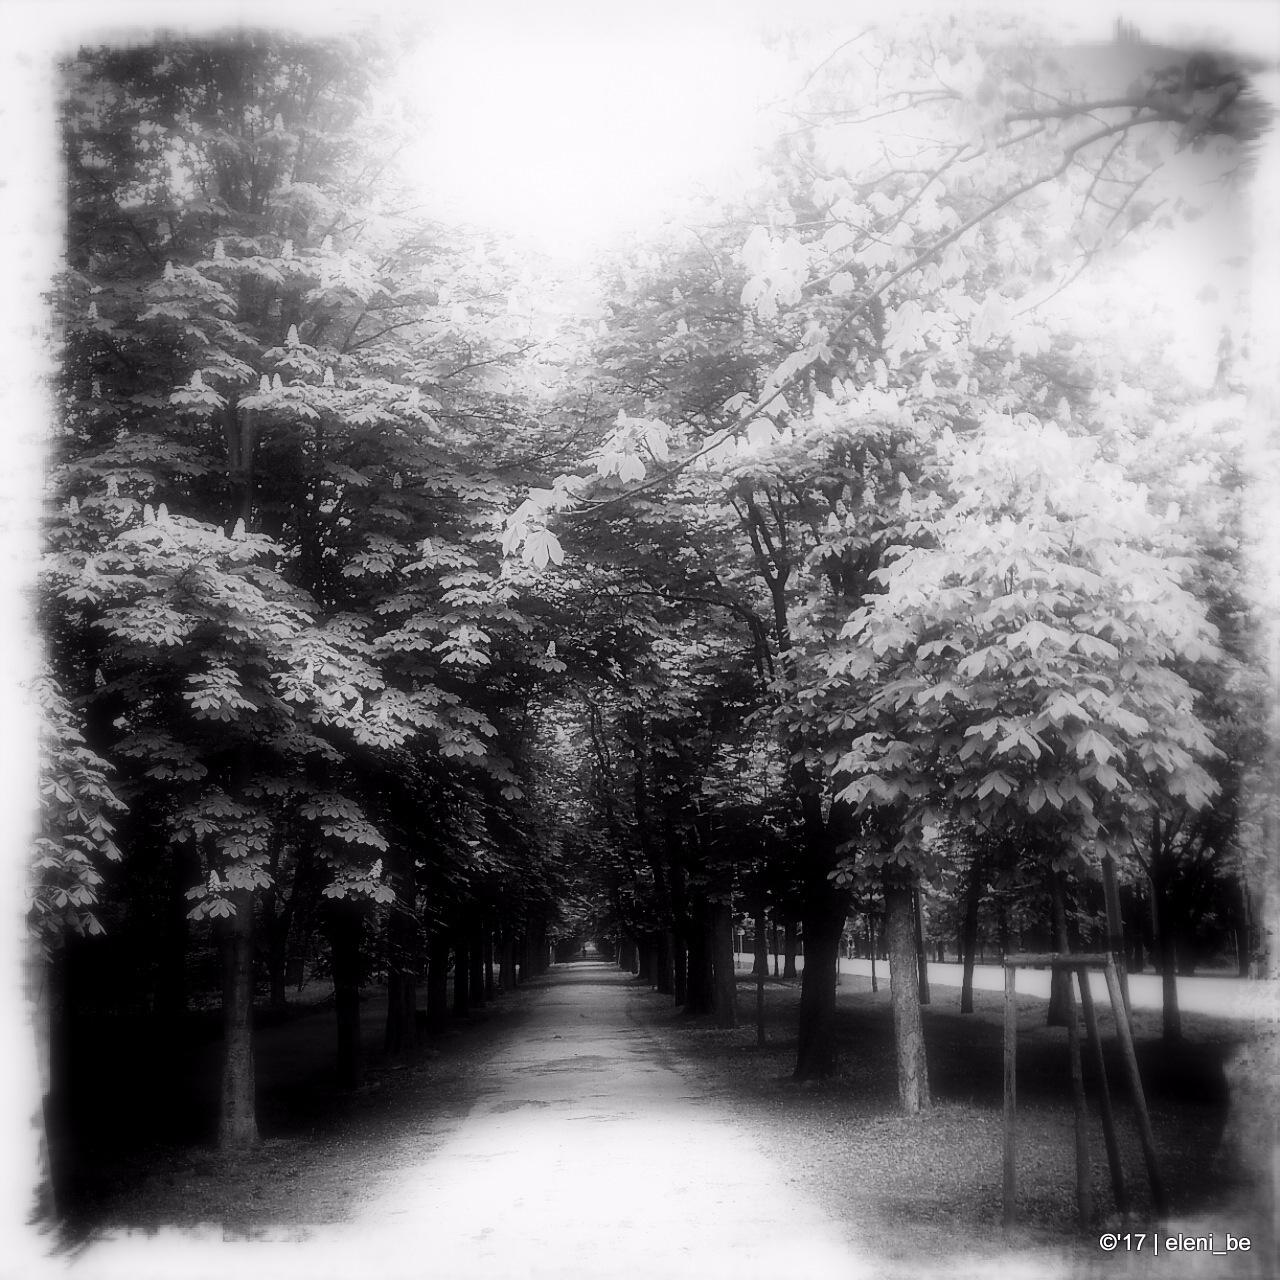 19:10 Spring Sprang (Dreamlike - eleni_be | ello